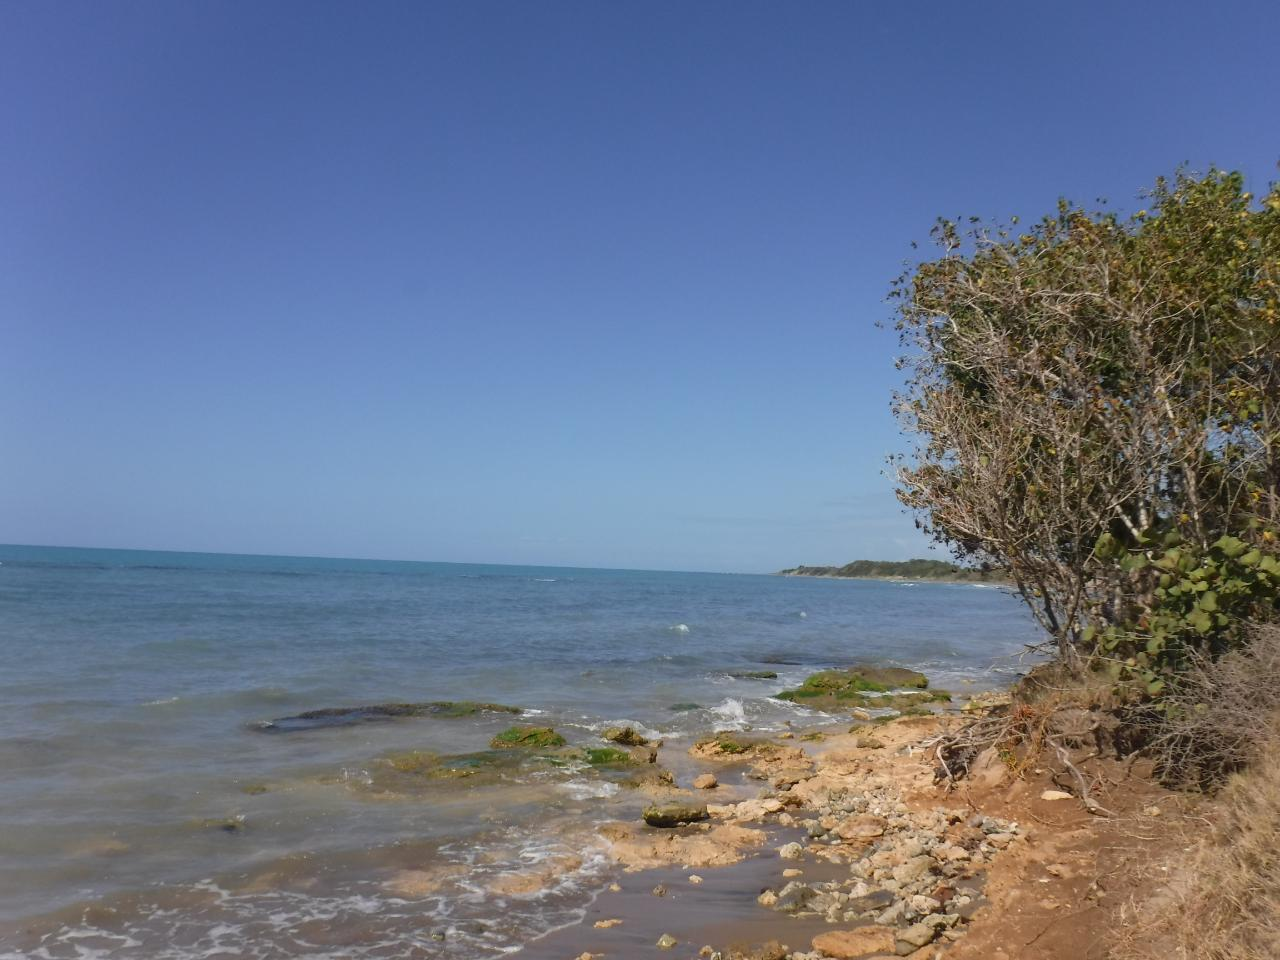 St. Elizabeth, Treasure Beach image - 3